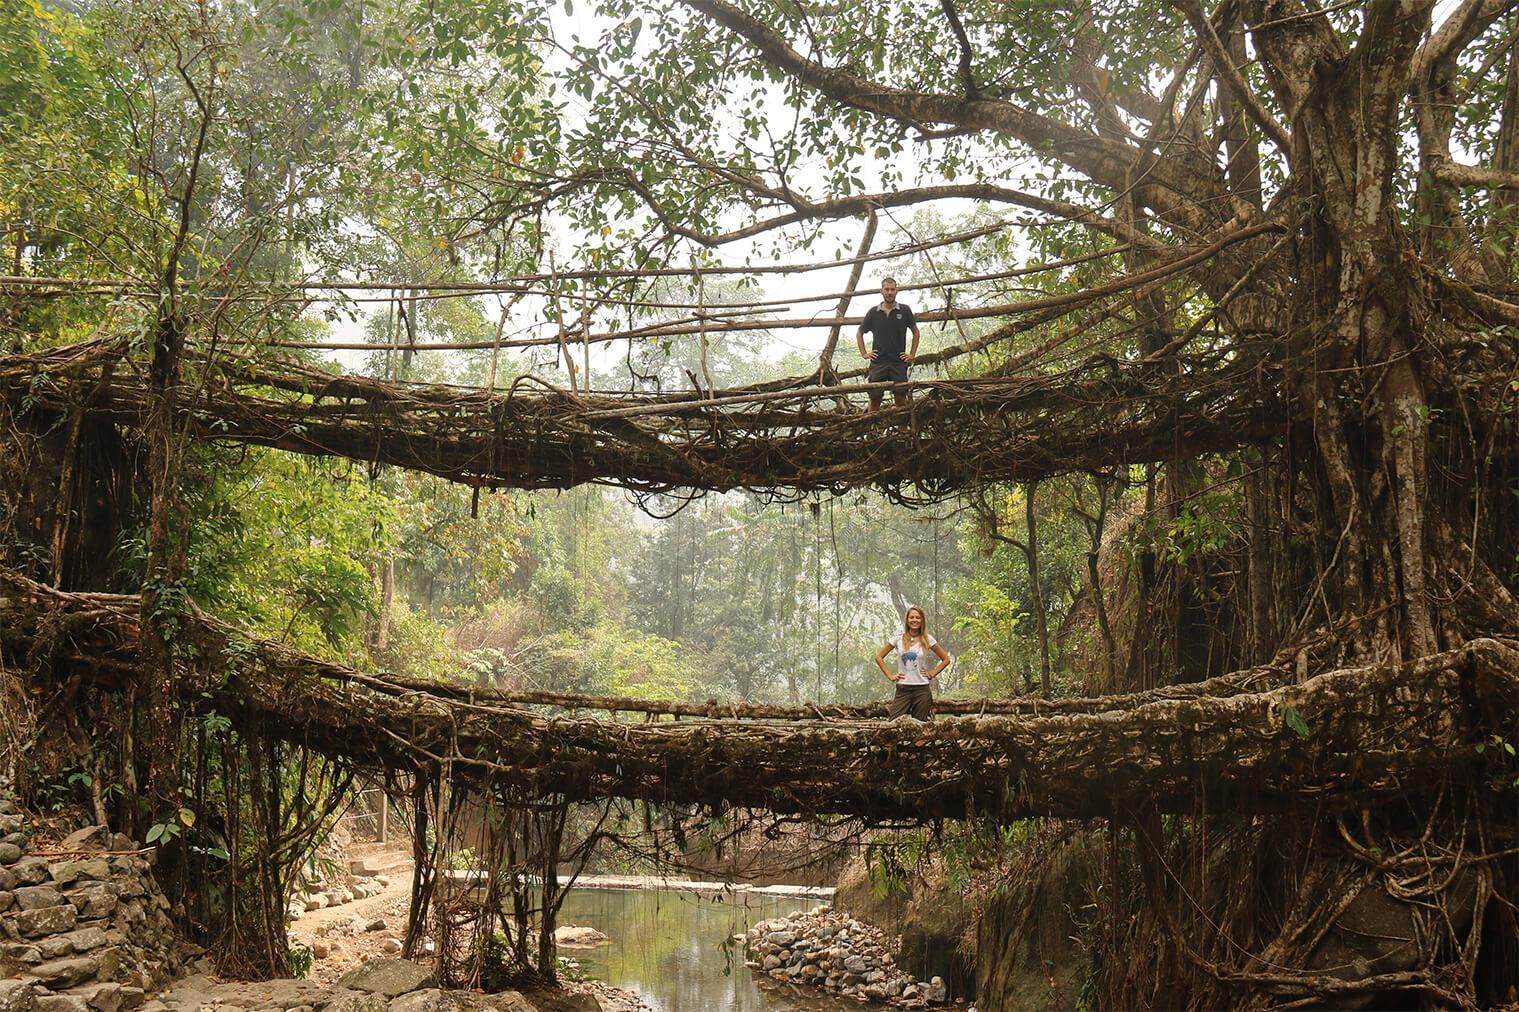 Koreňový most Doubledecker, severovýchodná India